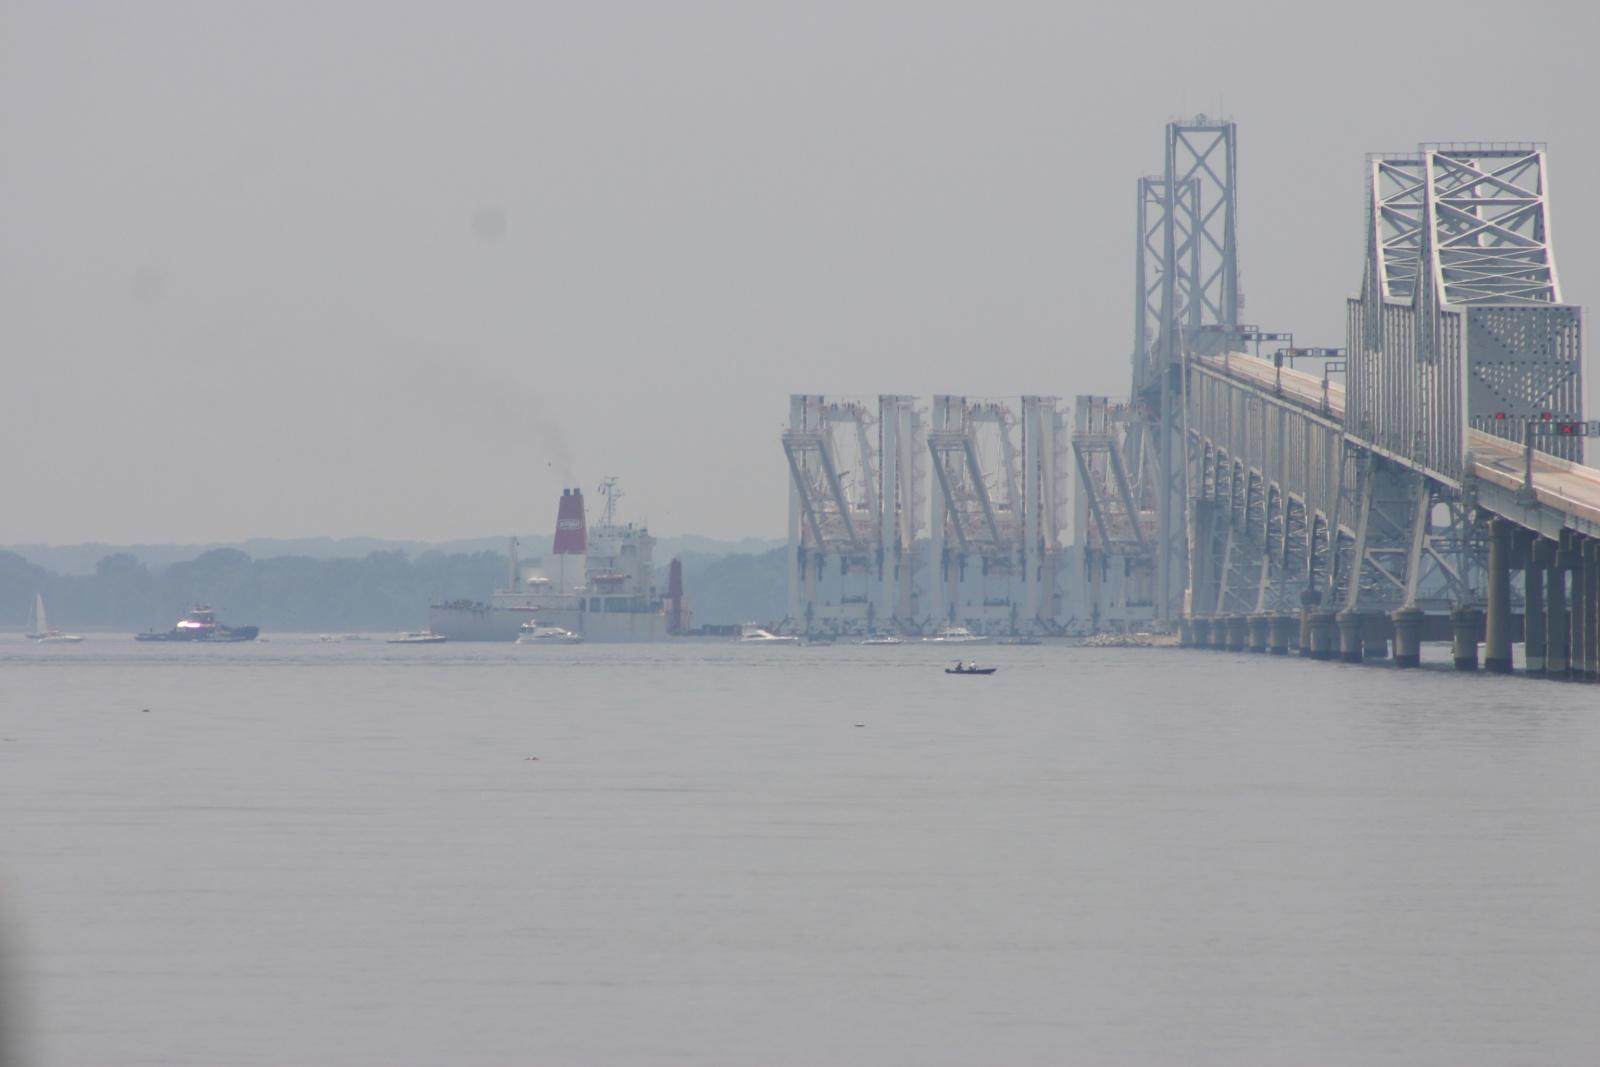 Click image for larger version  Name:chesapeke bay bridge today.jpg Views:136 Size:245.5 KB ID:42564